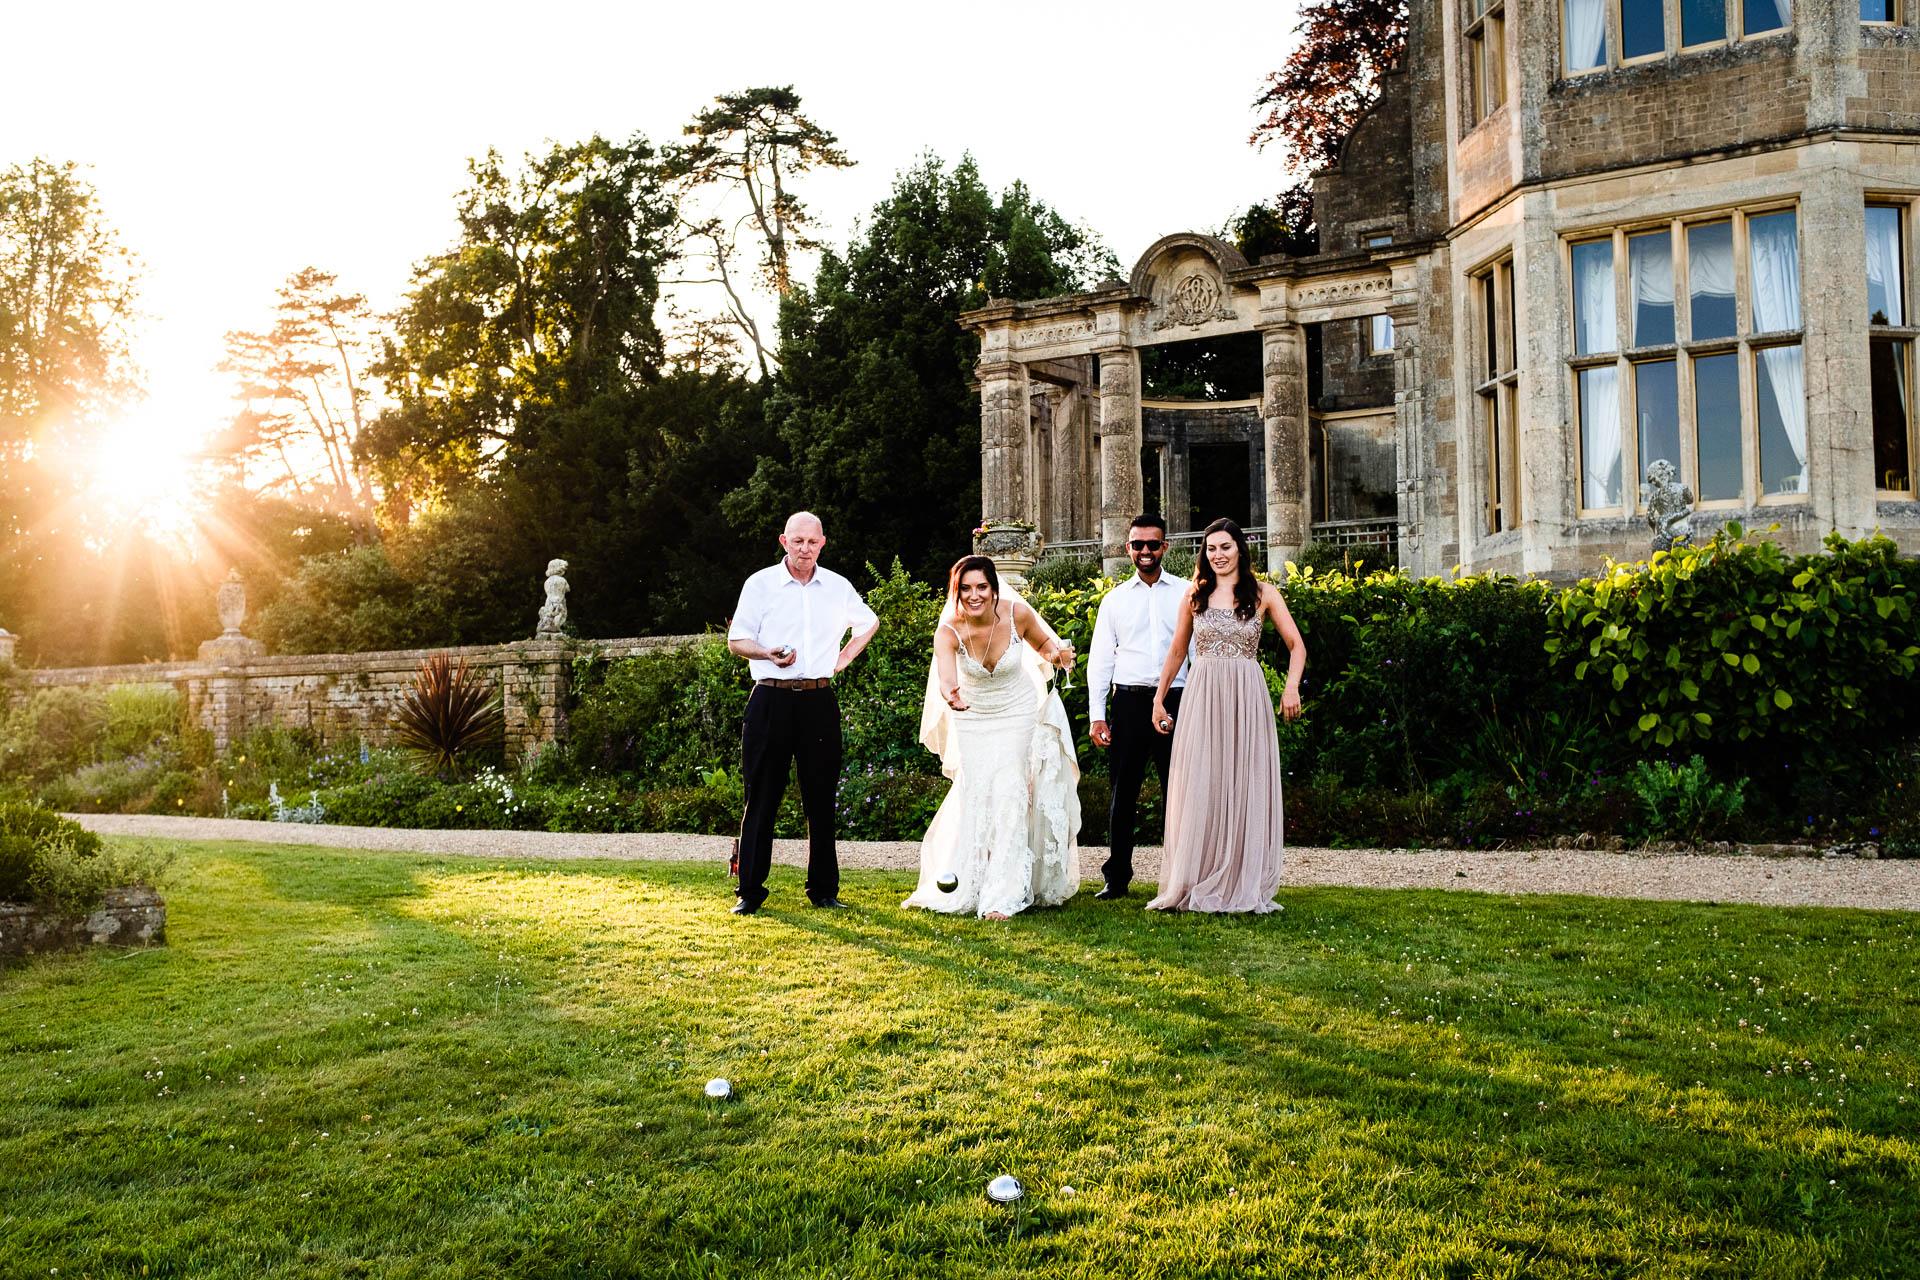 orchardleigh house wedding - Danni & Barney (443).jpg